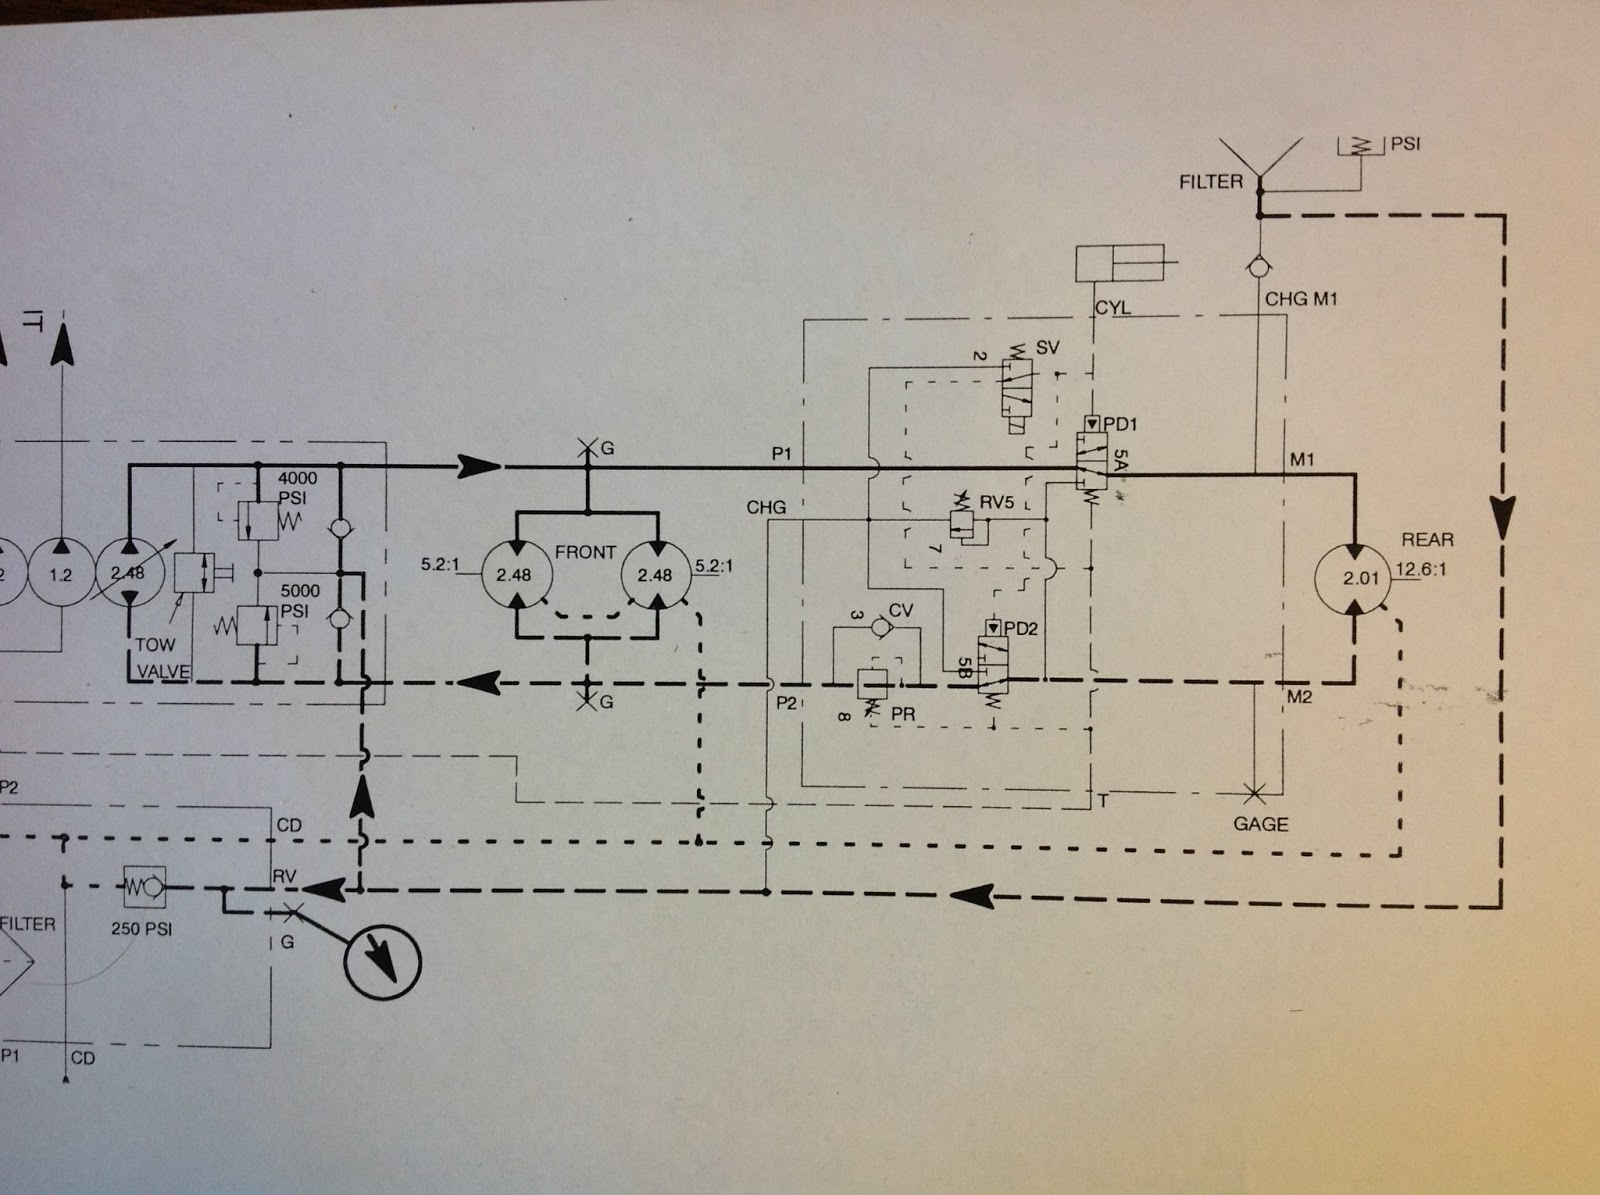 mti service Bobcat Mower Wiring Diagrams Toro Wiring Diagram For 4000 #15